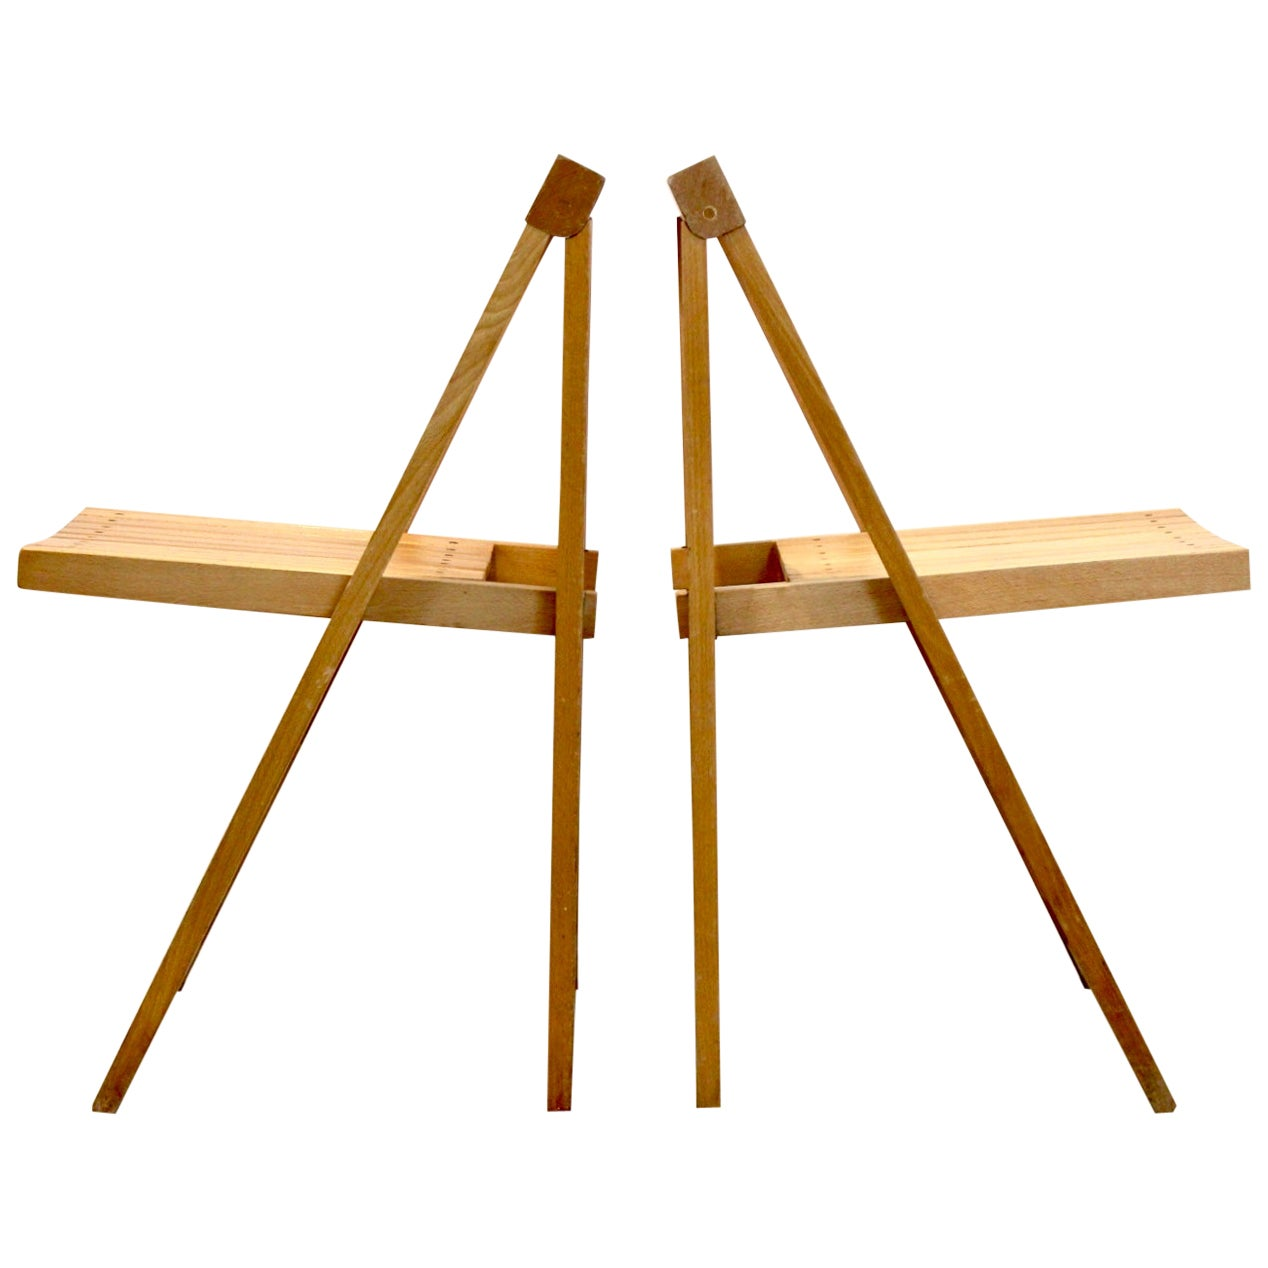 Large Stock of Aldo Jacober Folding Chairs for Alberto Bazzani